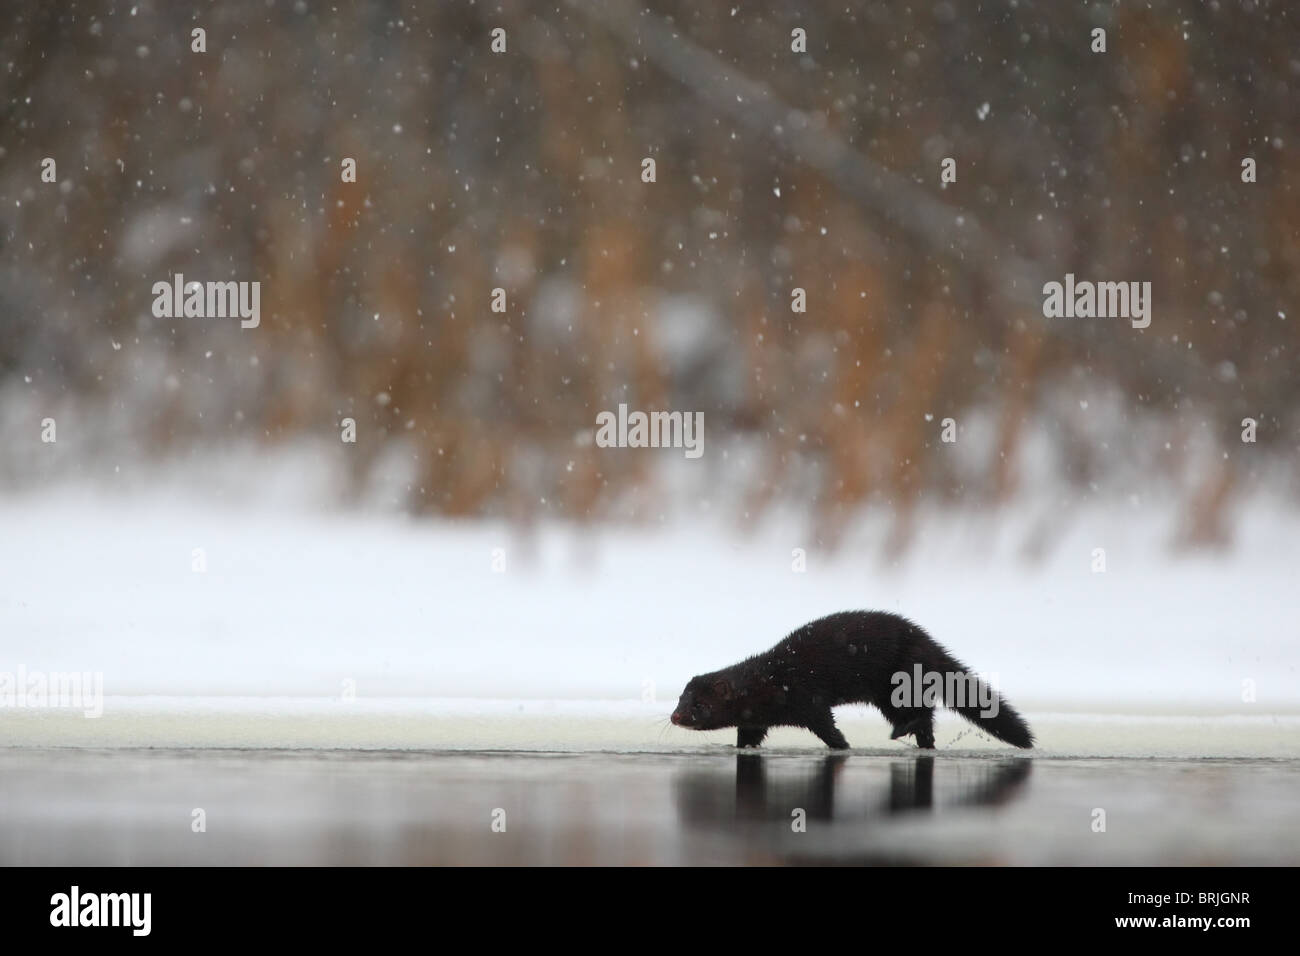 Wild American Mink (Mustela vison) walking on riverbank, looking for food. Europe. - Stock Image